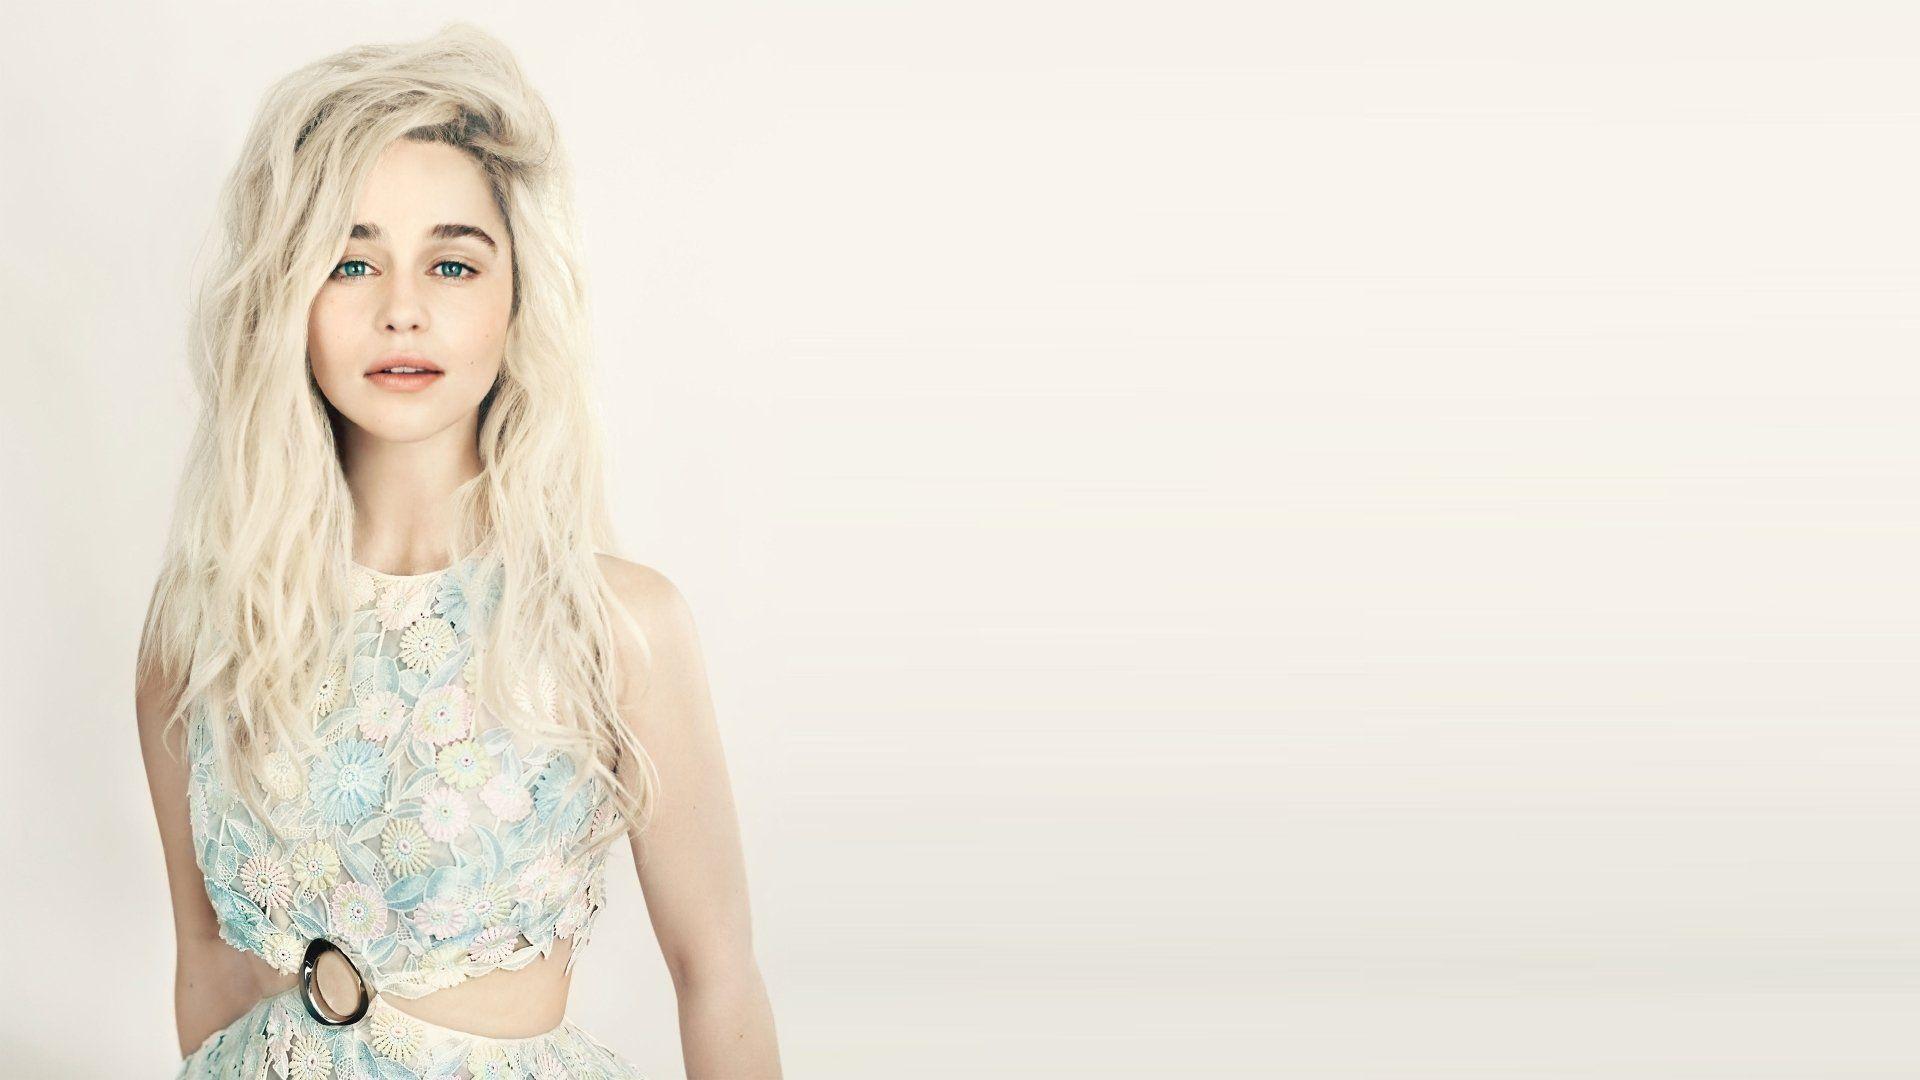 Emilia Clarke Hd Wallpapers Wallpaper Cave